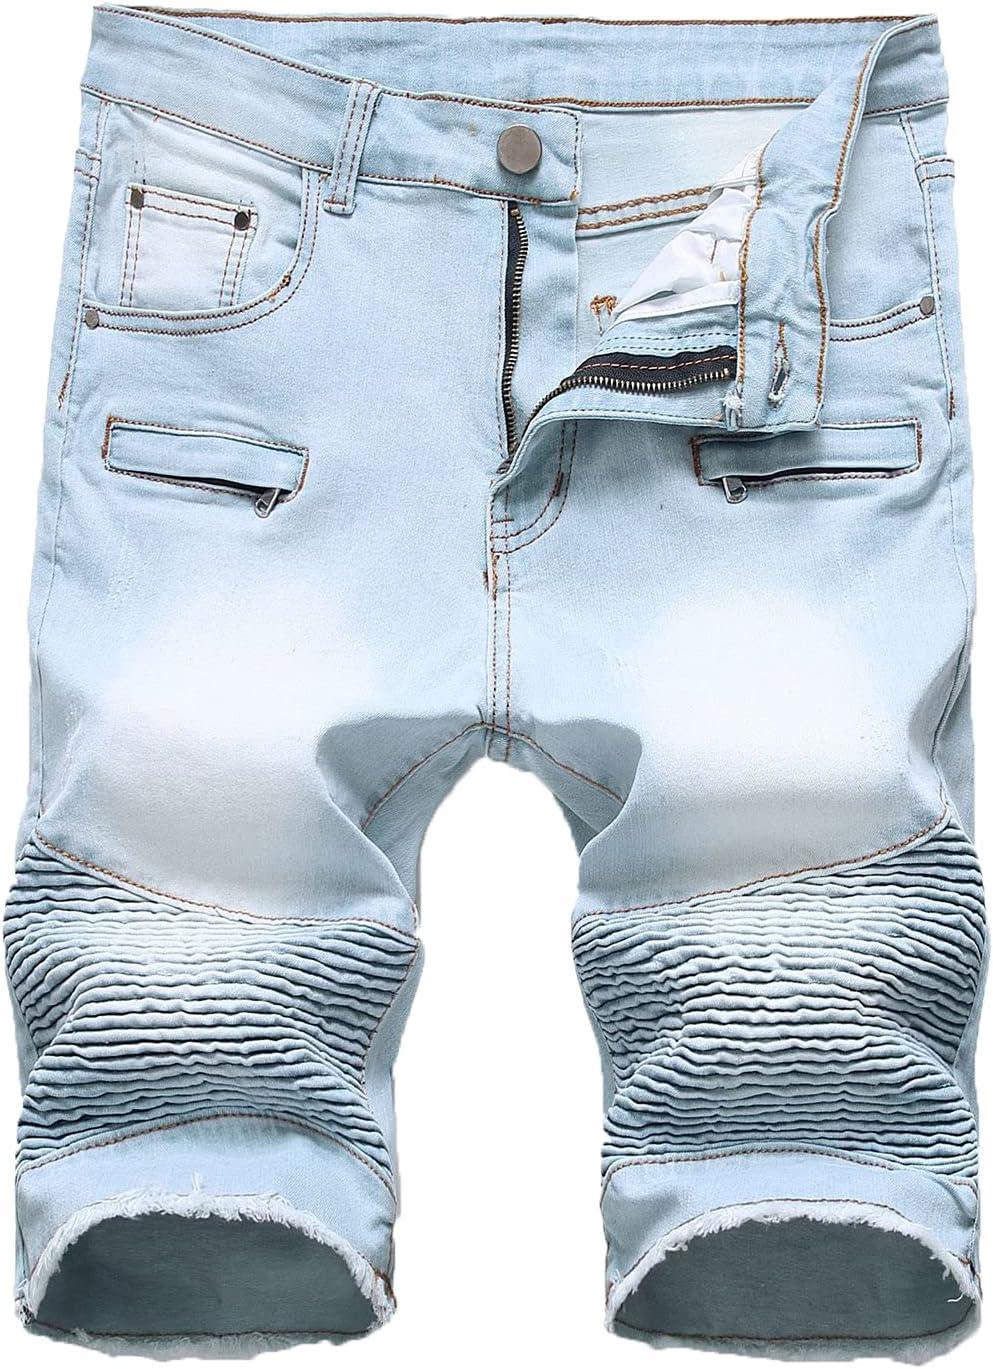 Men's Biker Denim Shorts Ripped Vintage Slim Zip Short Jeans Cool Fashion Pleated Fray Pockets Short Jean Pants (Light blue1,31)